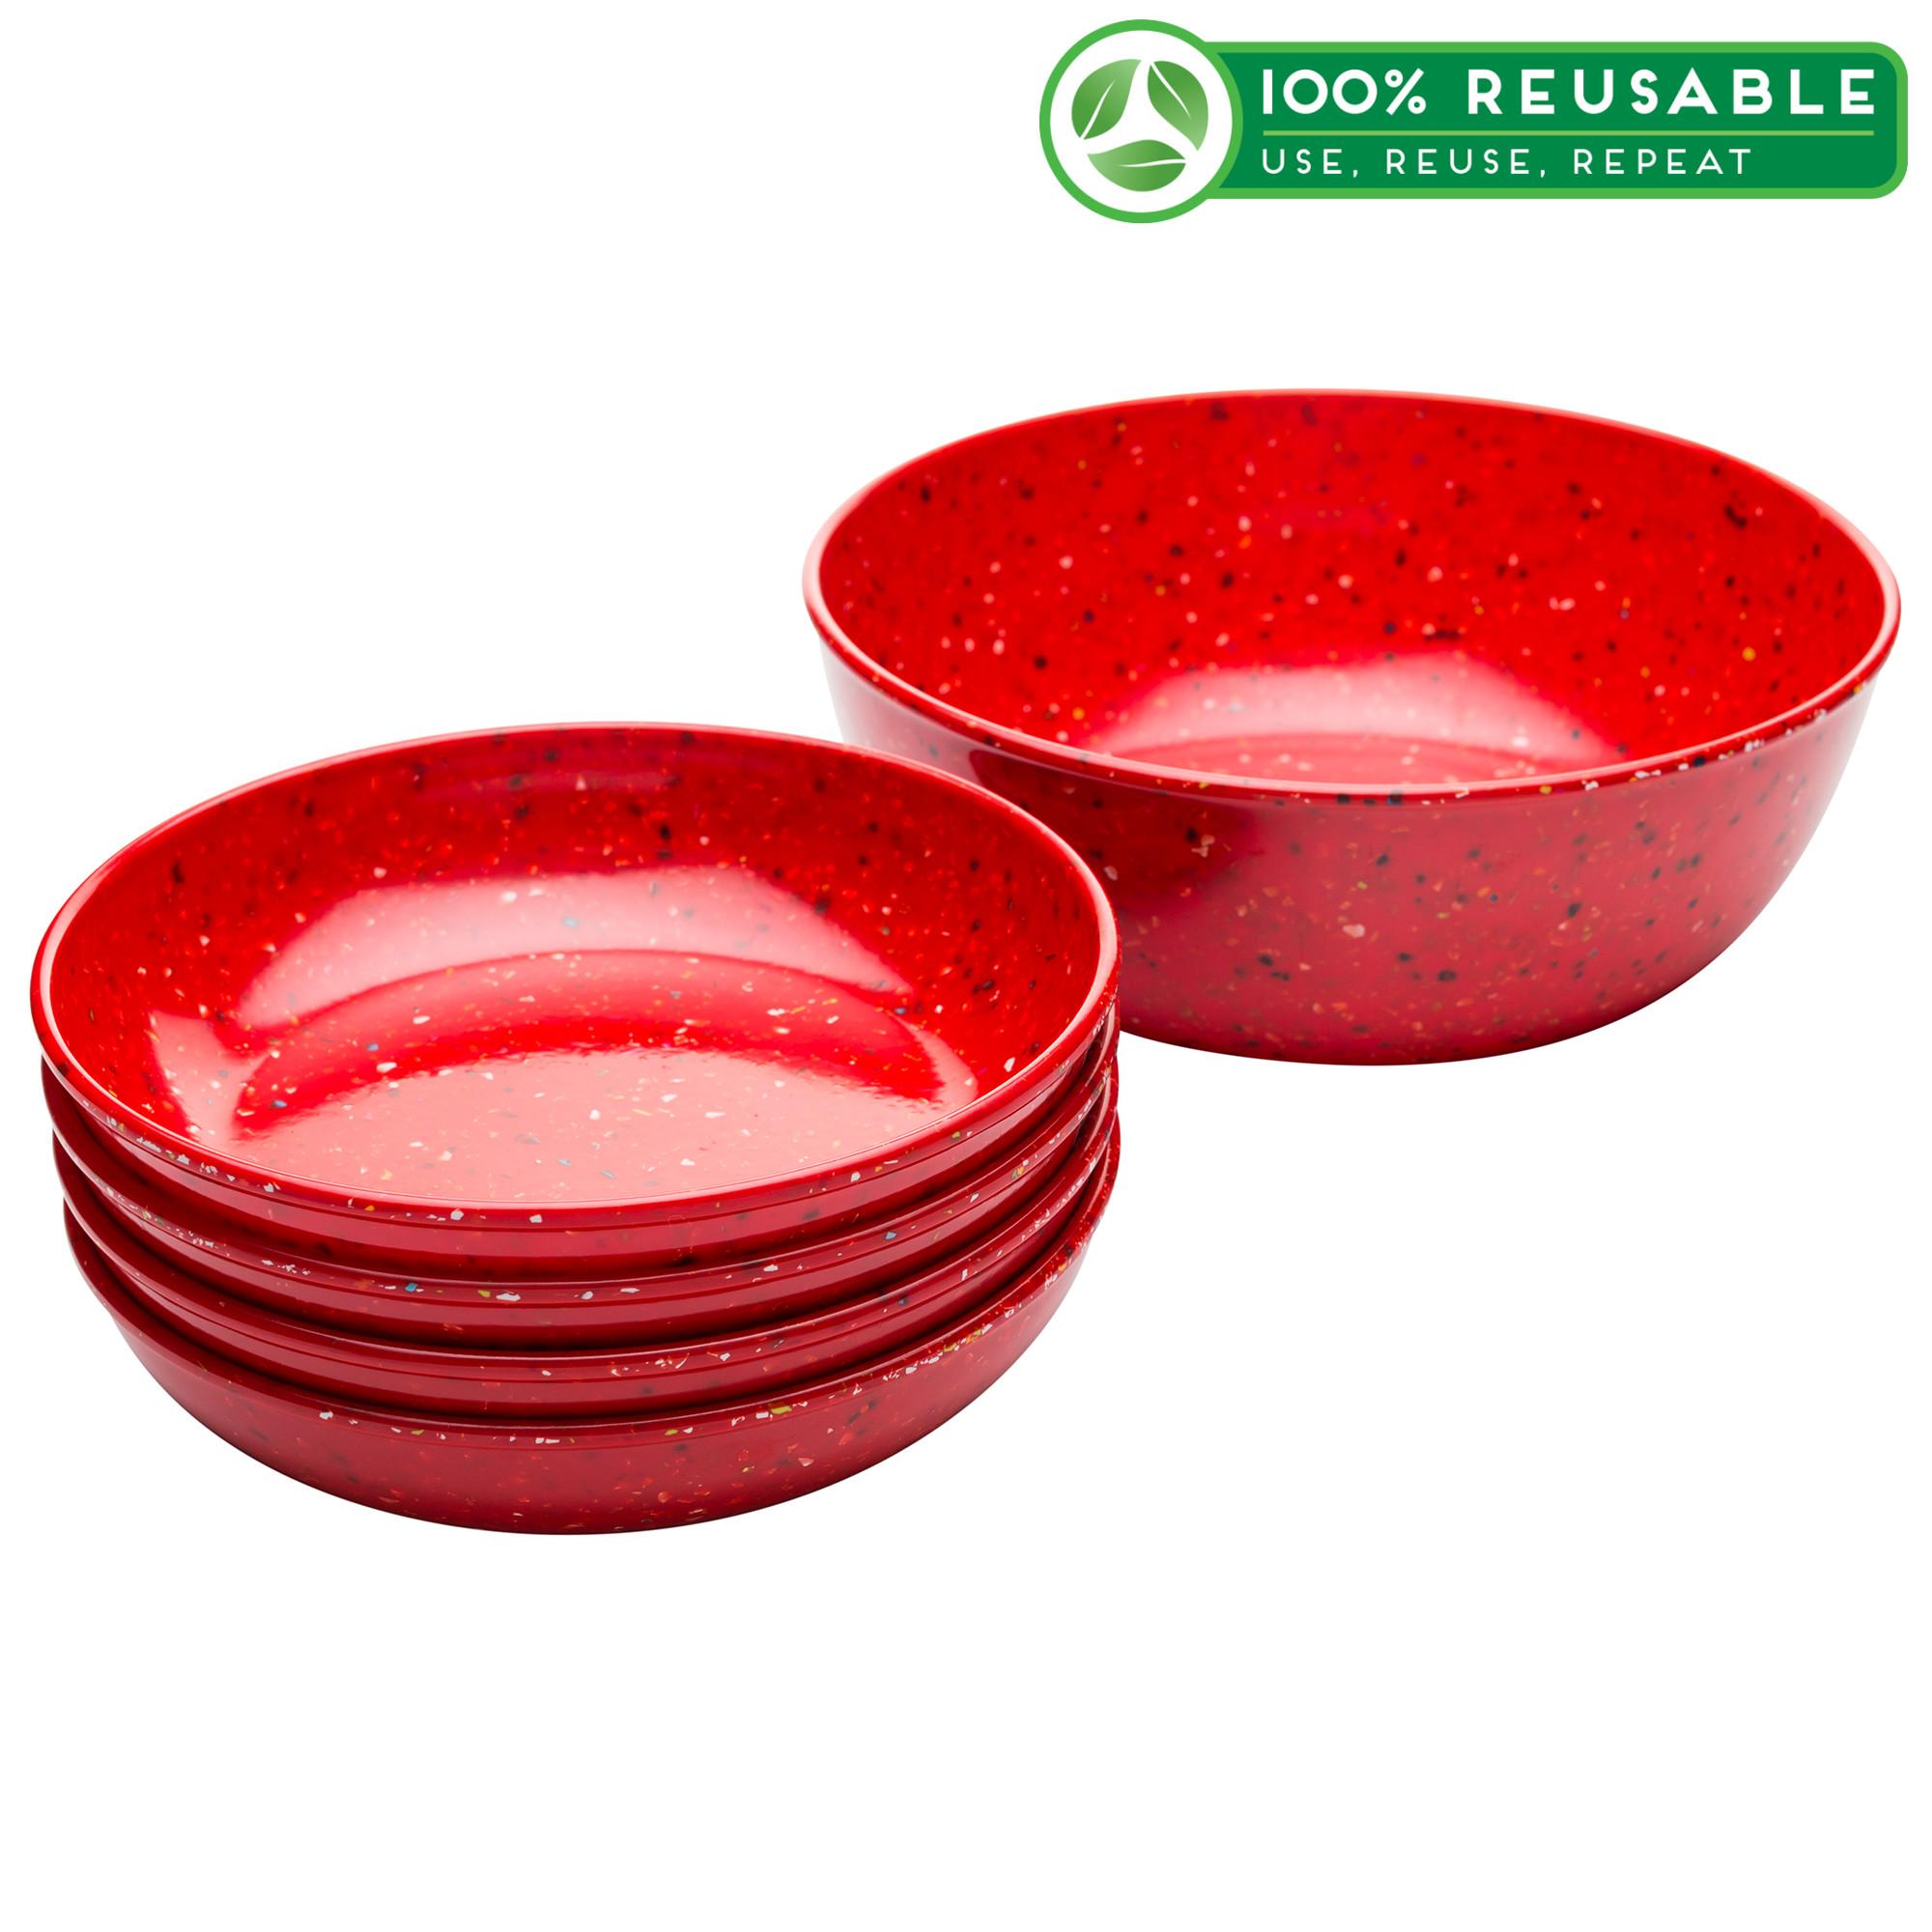 Confetti Pasta Bowl Set, Red, 5-piece set slideshow image 1